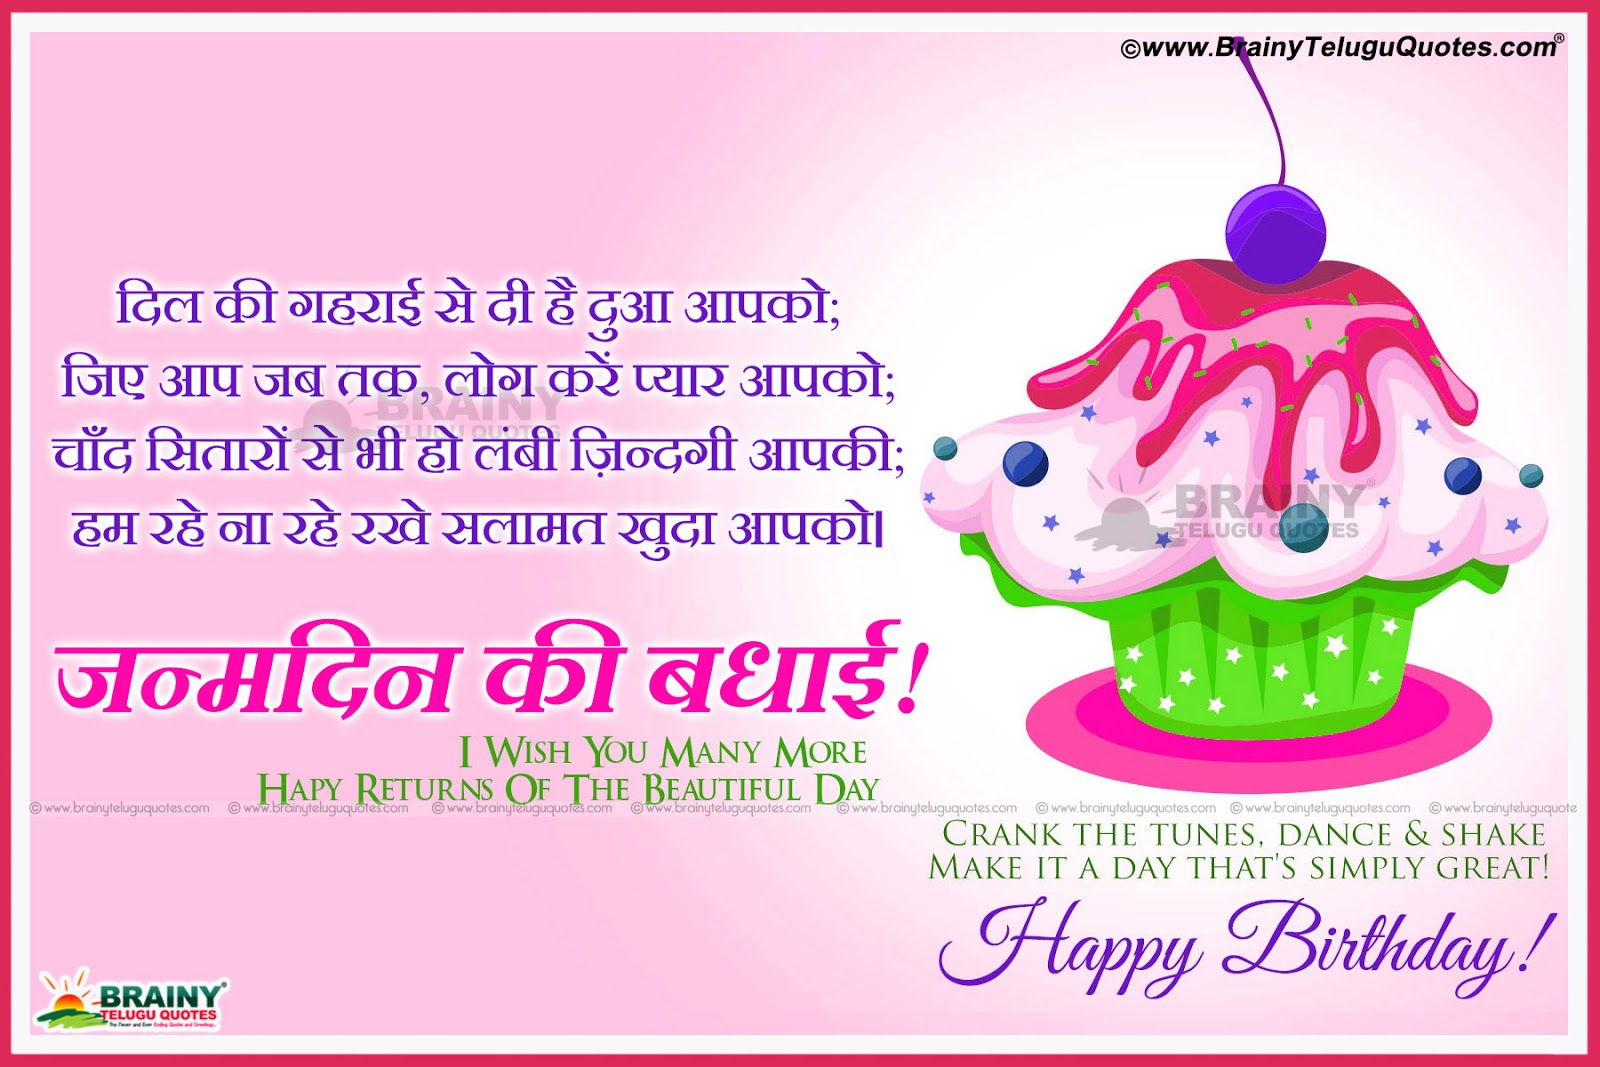 Happy Birthday Quotes In Hindi: Latest Hindi Happy Birthday Shayari And Quotes Greetings